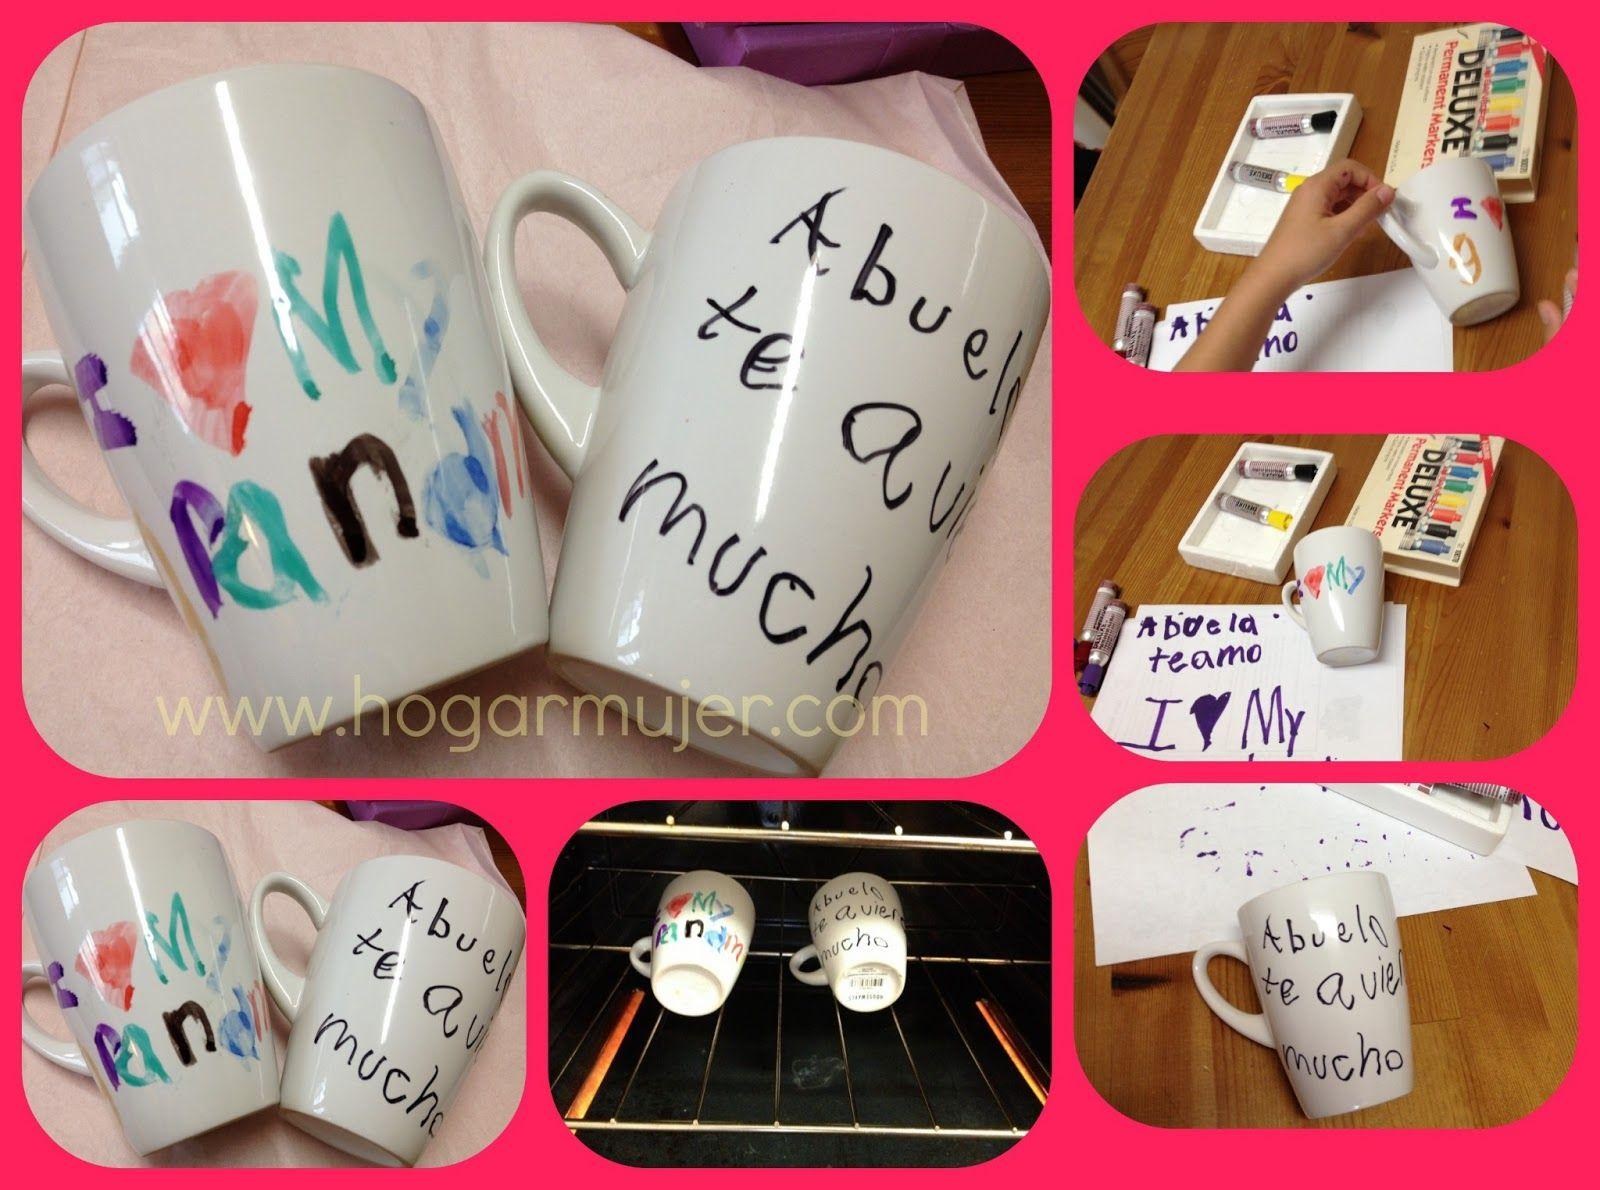 Manualidades para el dia de la madre crafts manualidades - Regalos para el dia de la madre manualidades ...